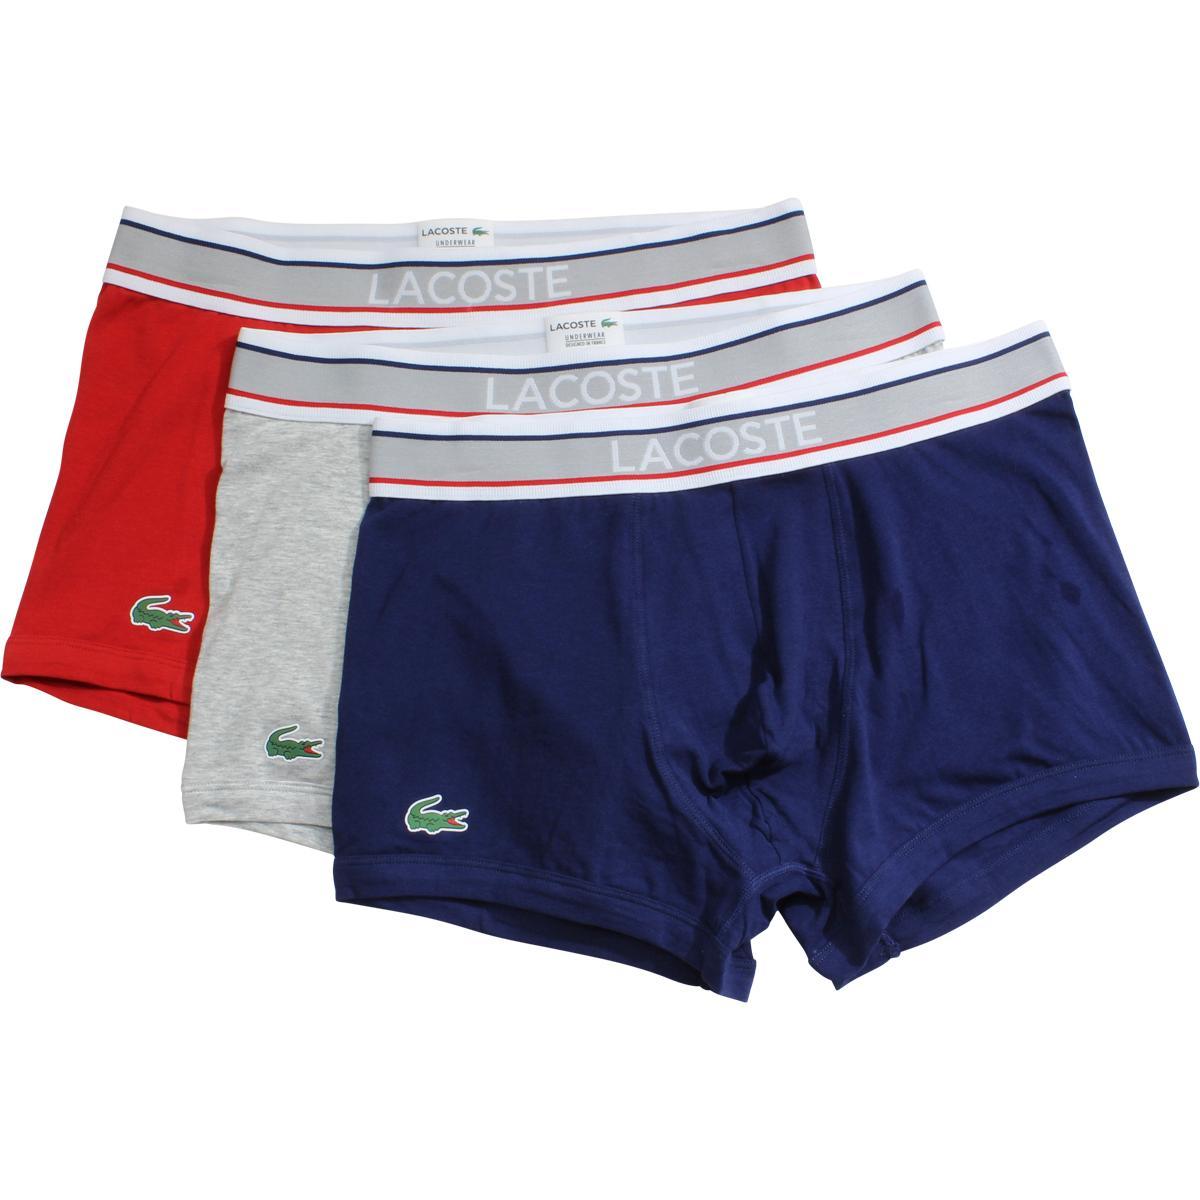 cd4148020 Lacoste Men s 3-Pc Colours Signature Stretch Boxers Underwear by Lacoste